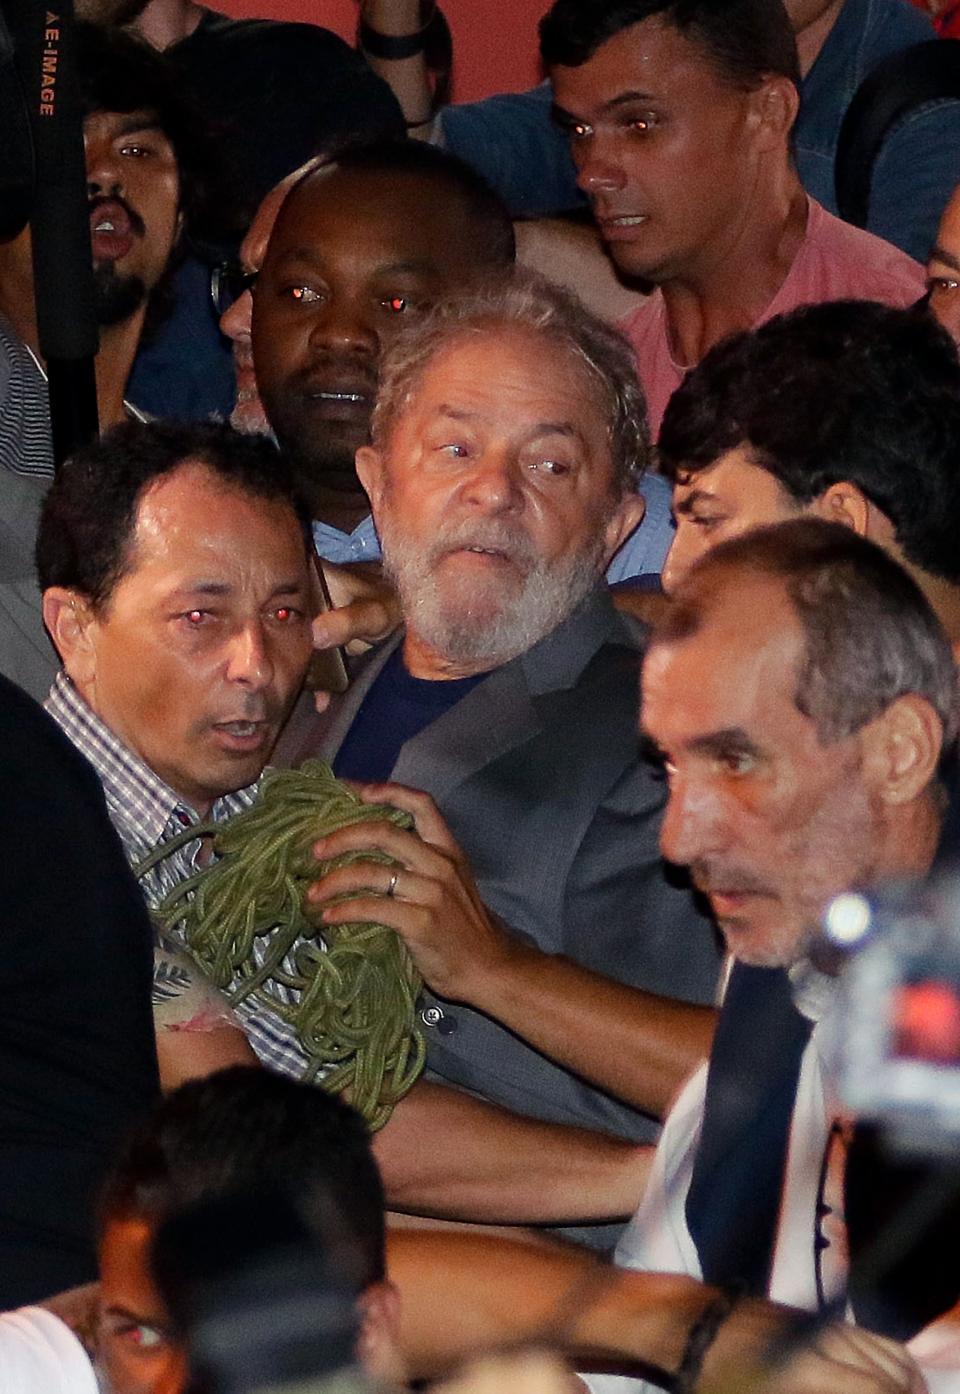 """¡Saldré de esta más fuerte, más  verdadero e inocente!"": Lula da Silva"